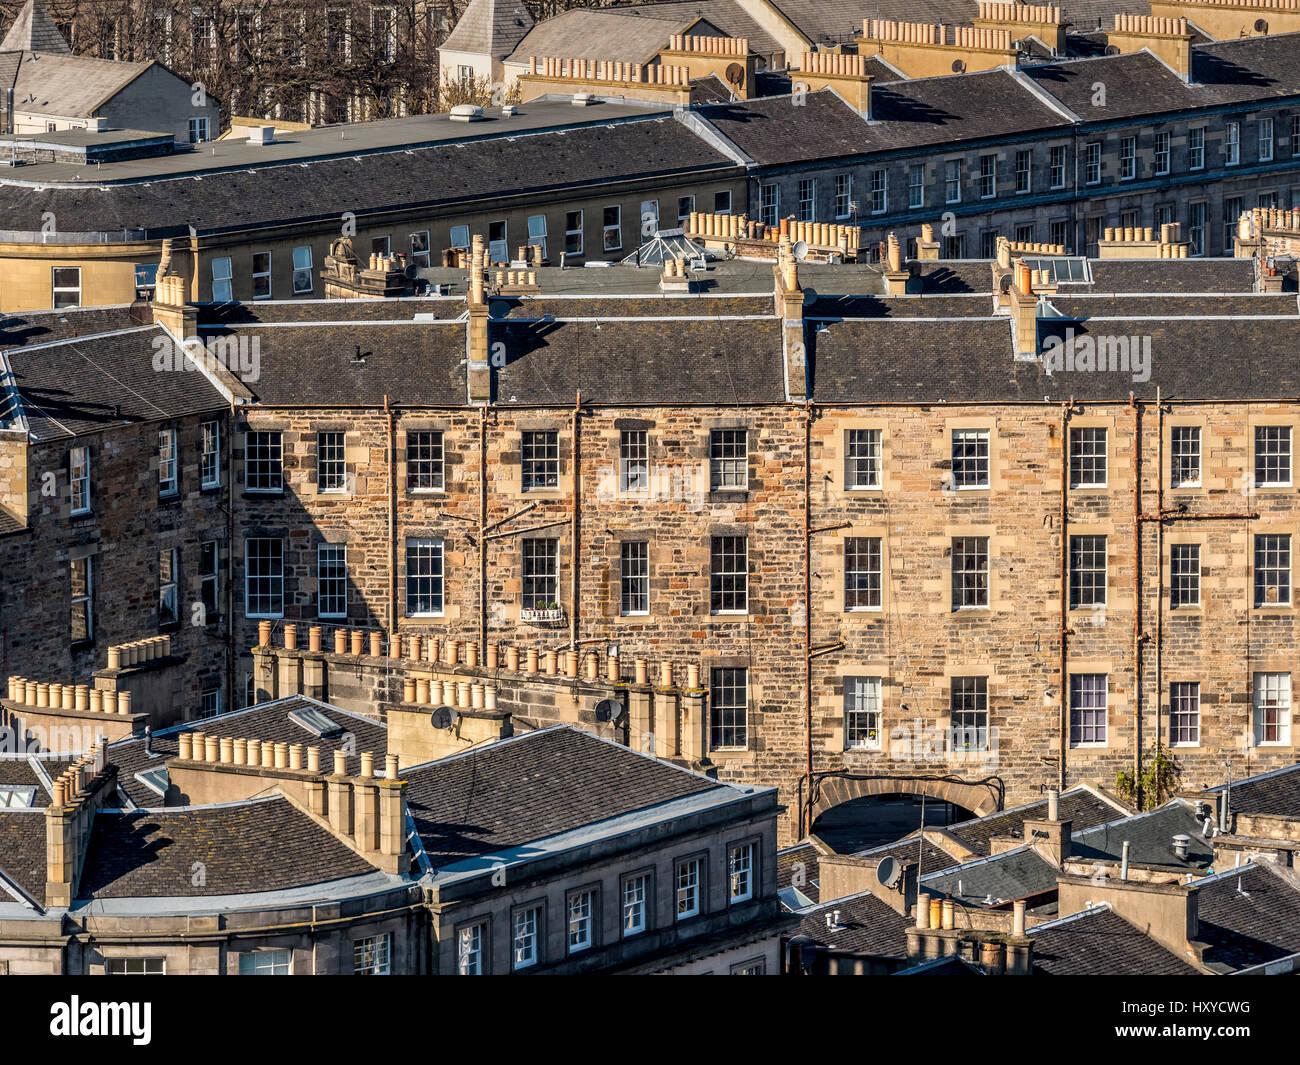 Residential housing in suburbs of Edinburgh, Scotland. Stock Photo